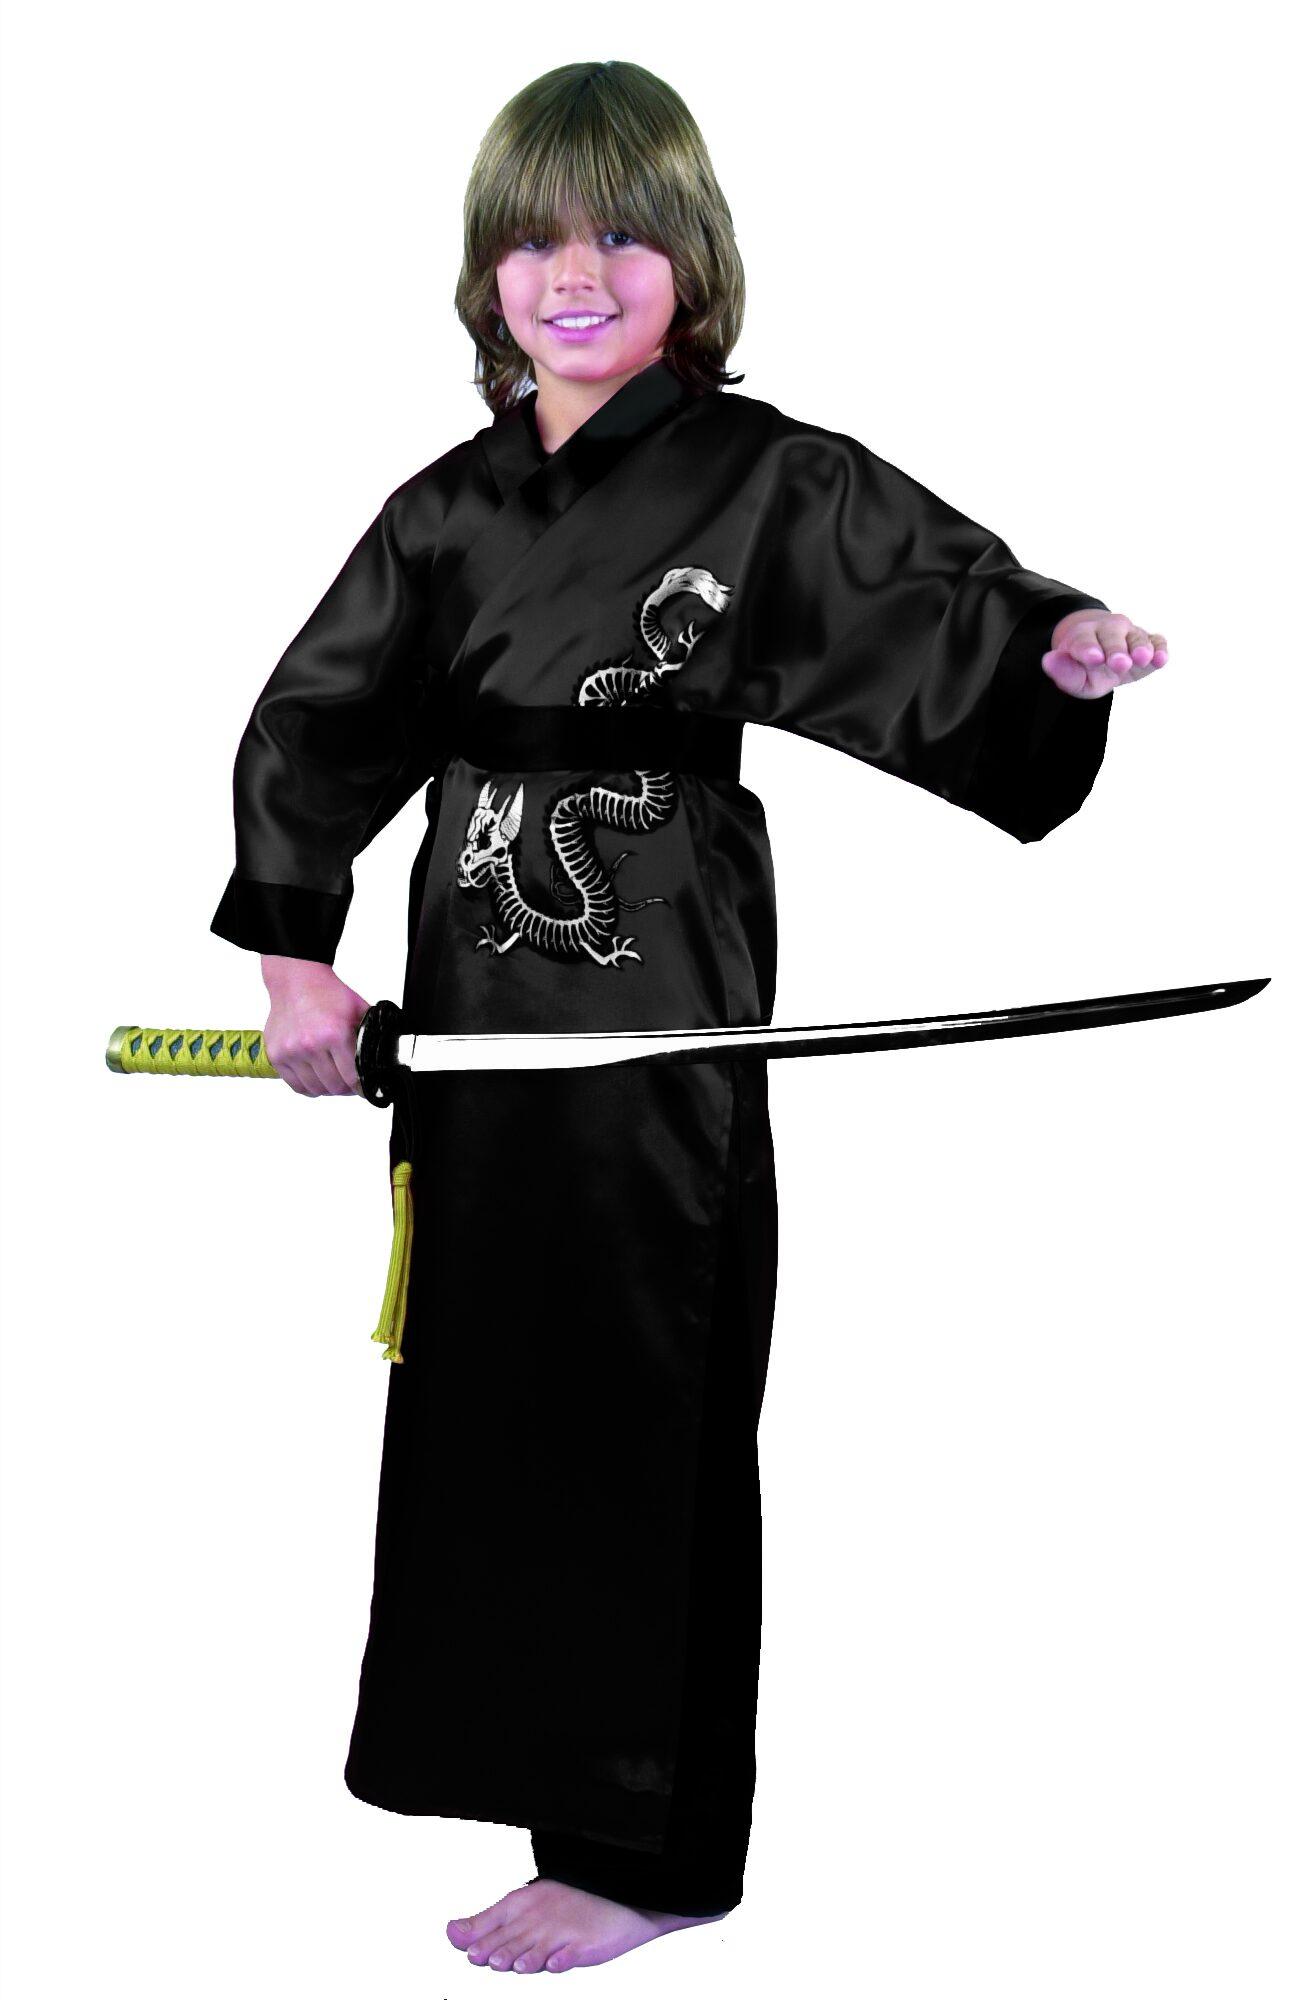 Dragon Master Samurai Ninja Kids Costume  sc 1 st  Mr. Costumes & Japanese Costumes - Mr. Costumes